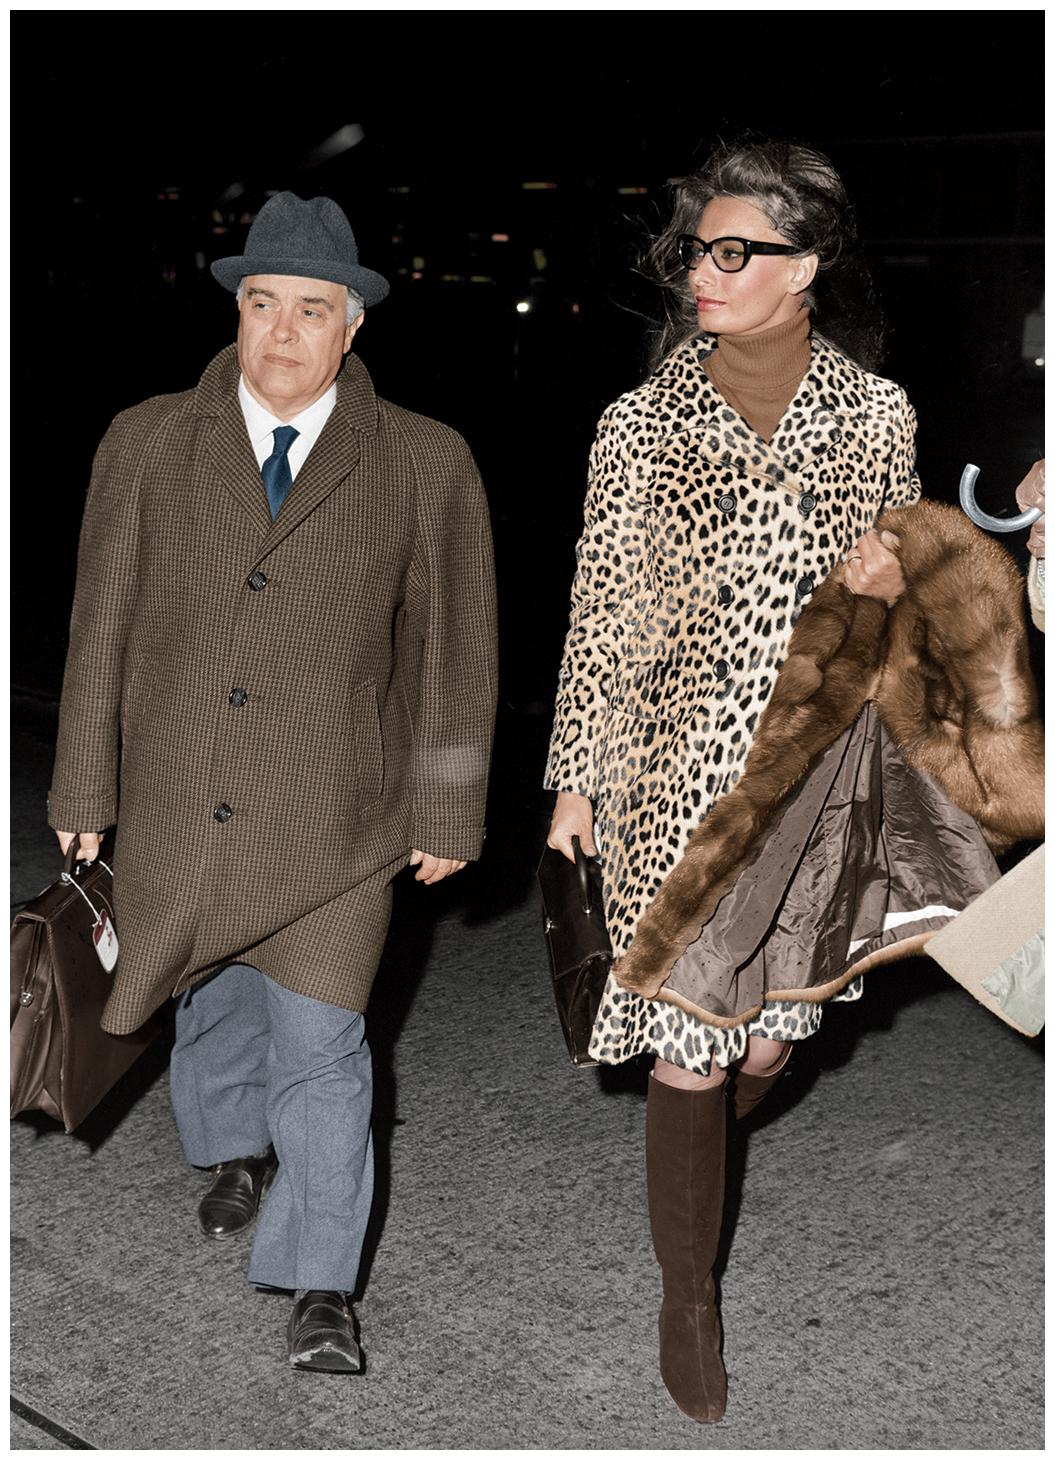 Carlo Ponti e Sophia loren Svizzera 1967